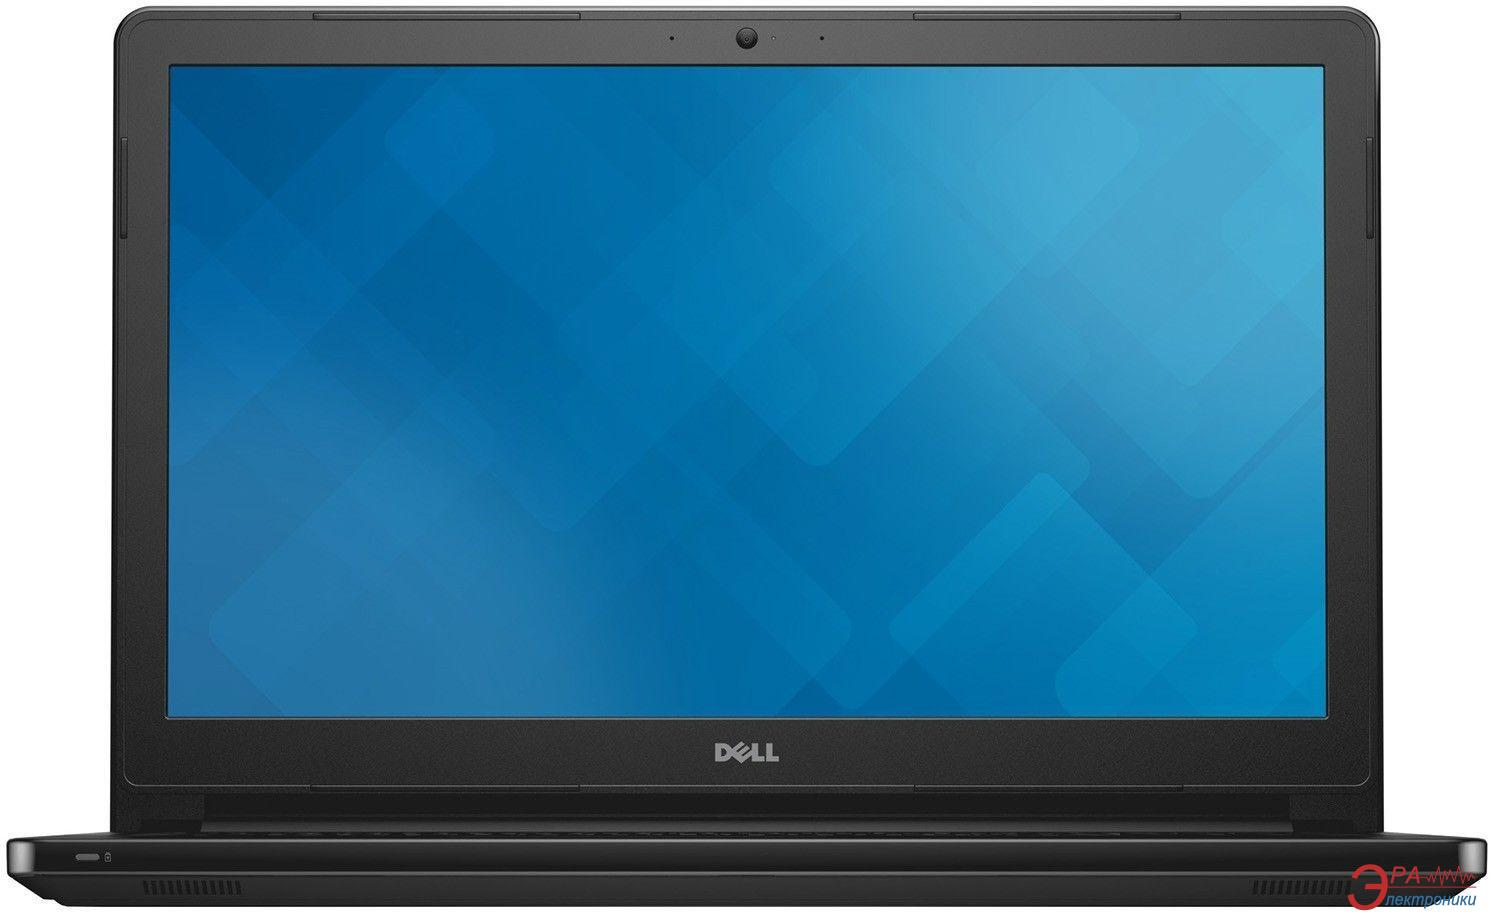 Ноутбук Dell Vostro 15 3558 (VAN15BDW1701_011_win) Black 15,6